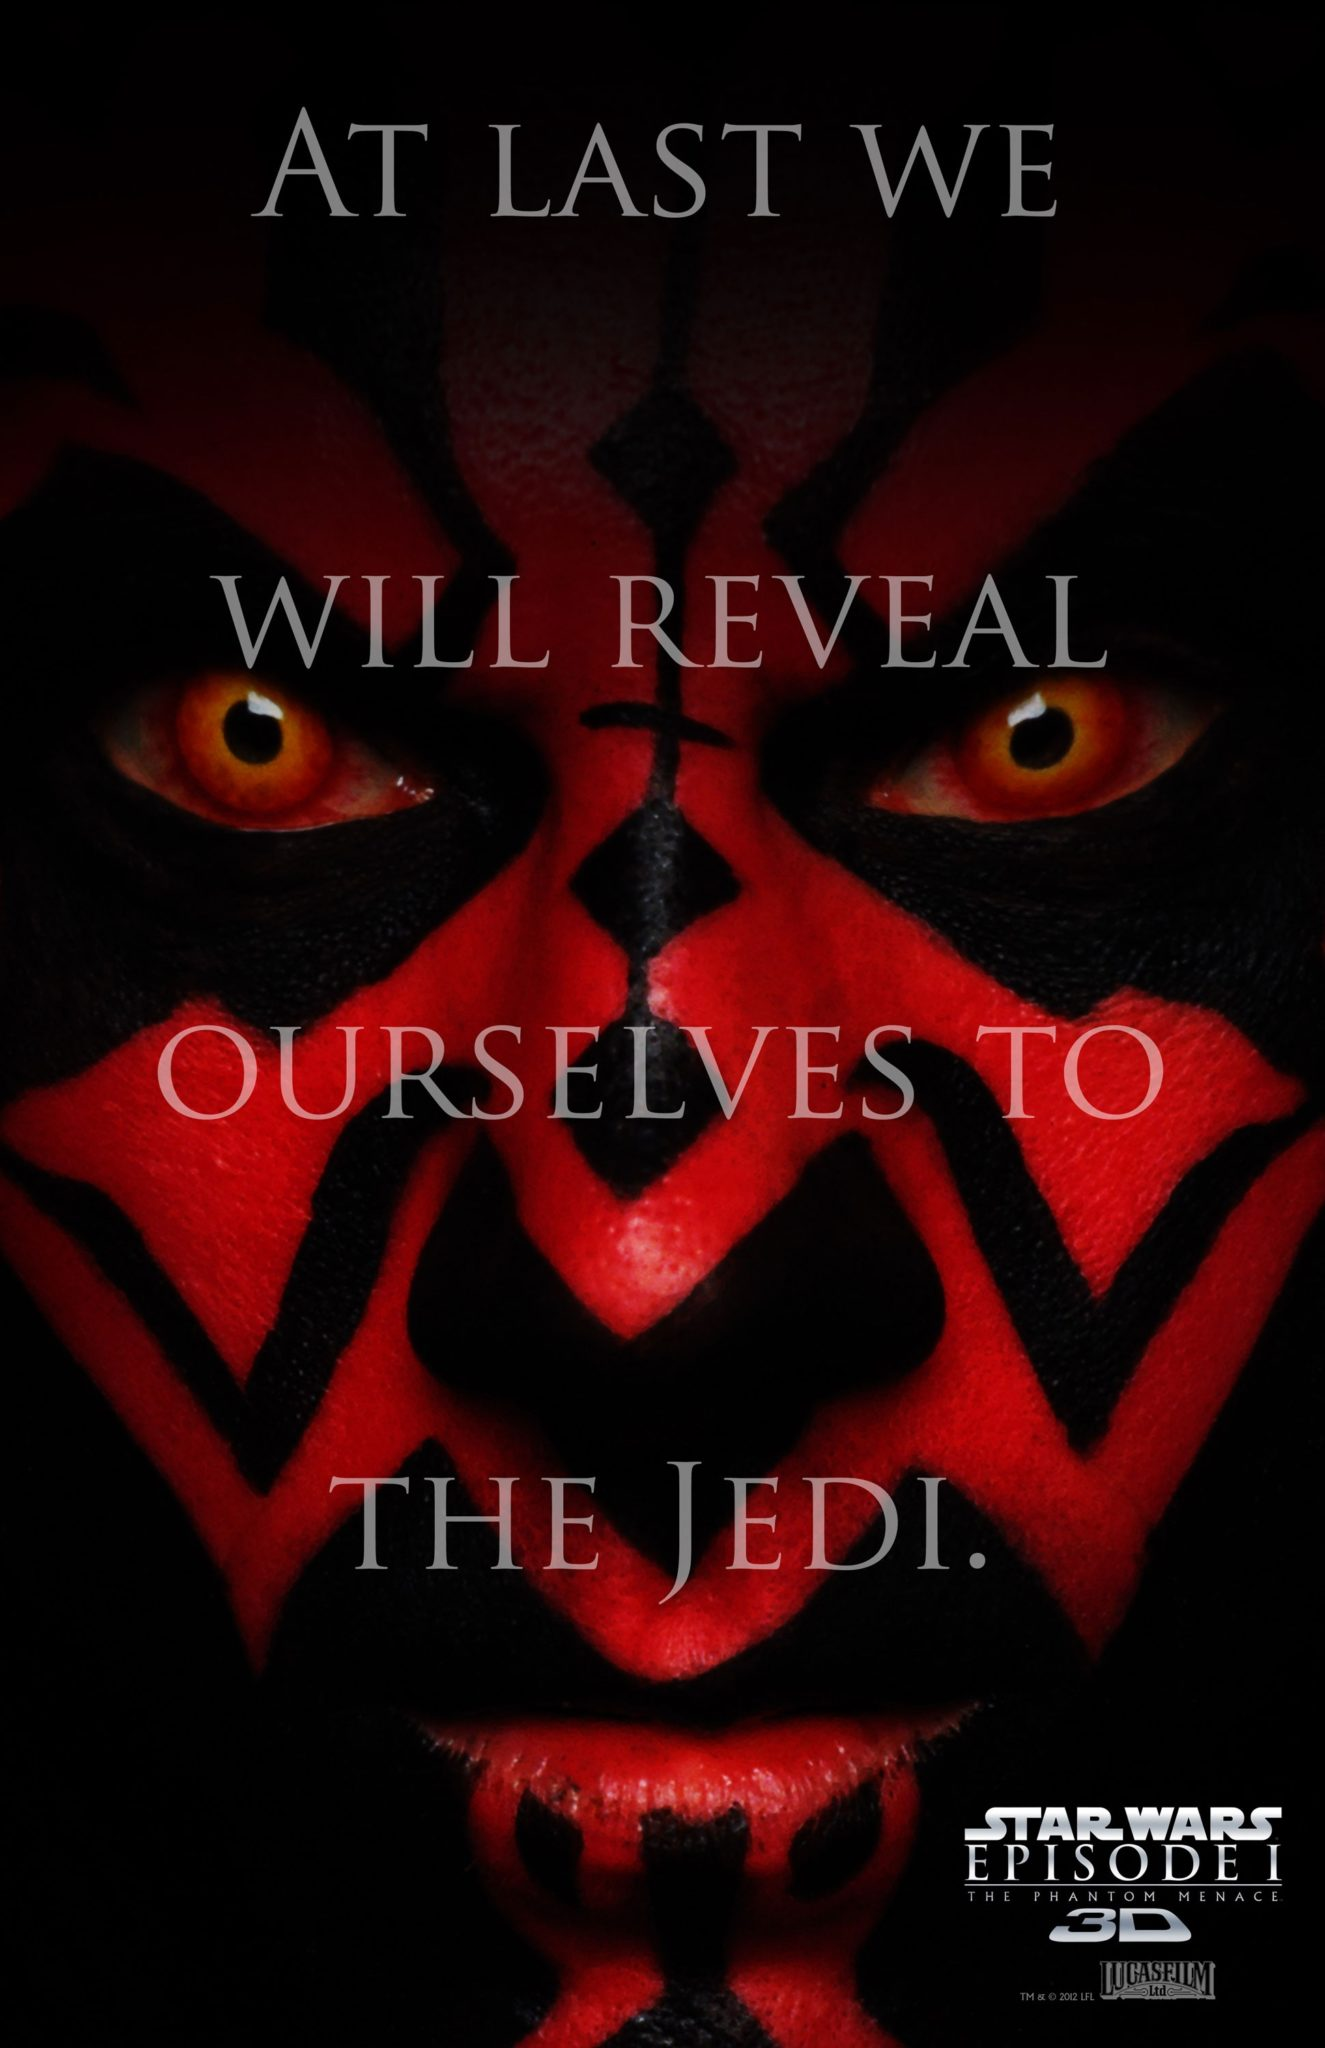 star-wars-episode-i-the-phantom-menace-poster-5